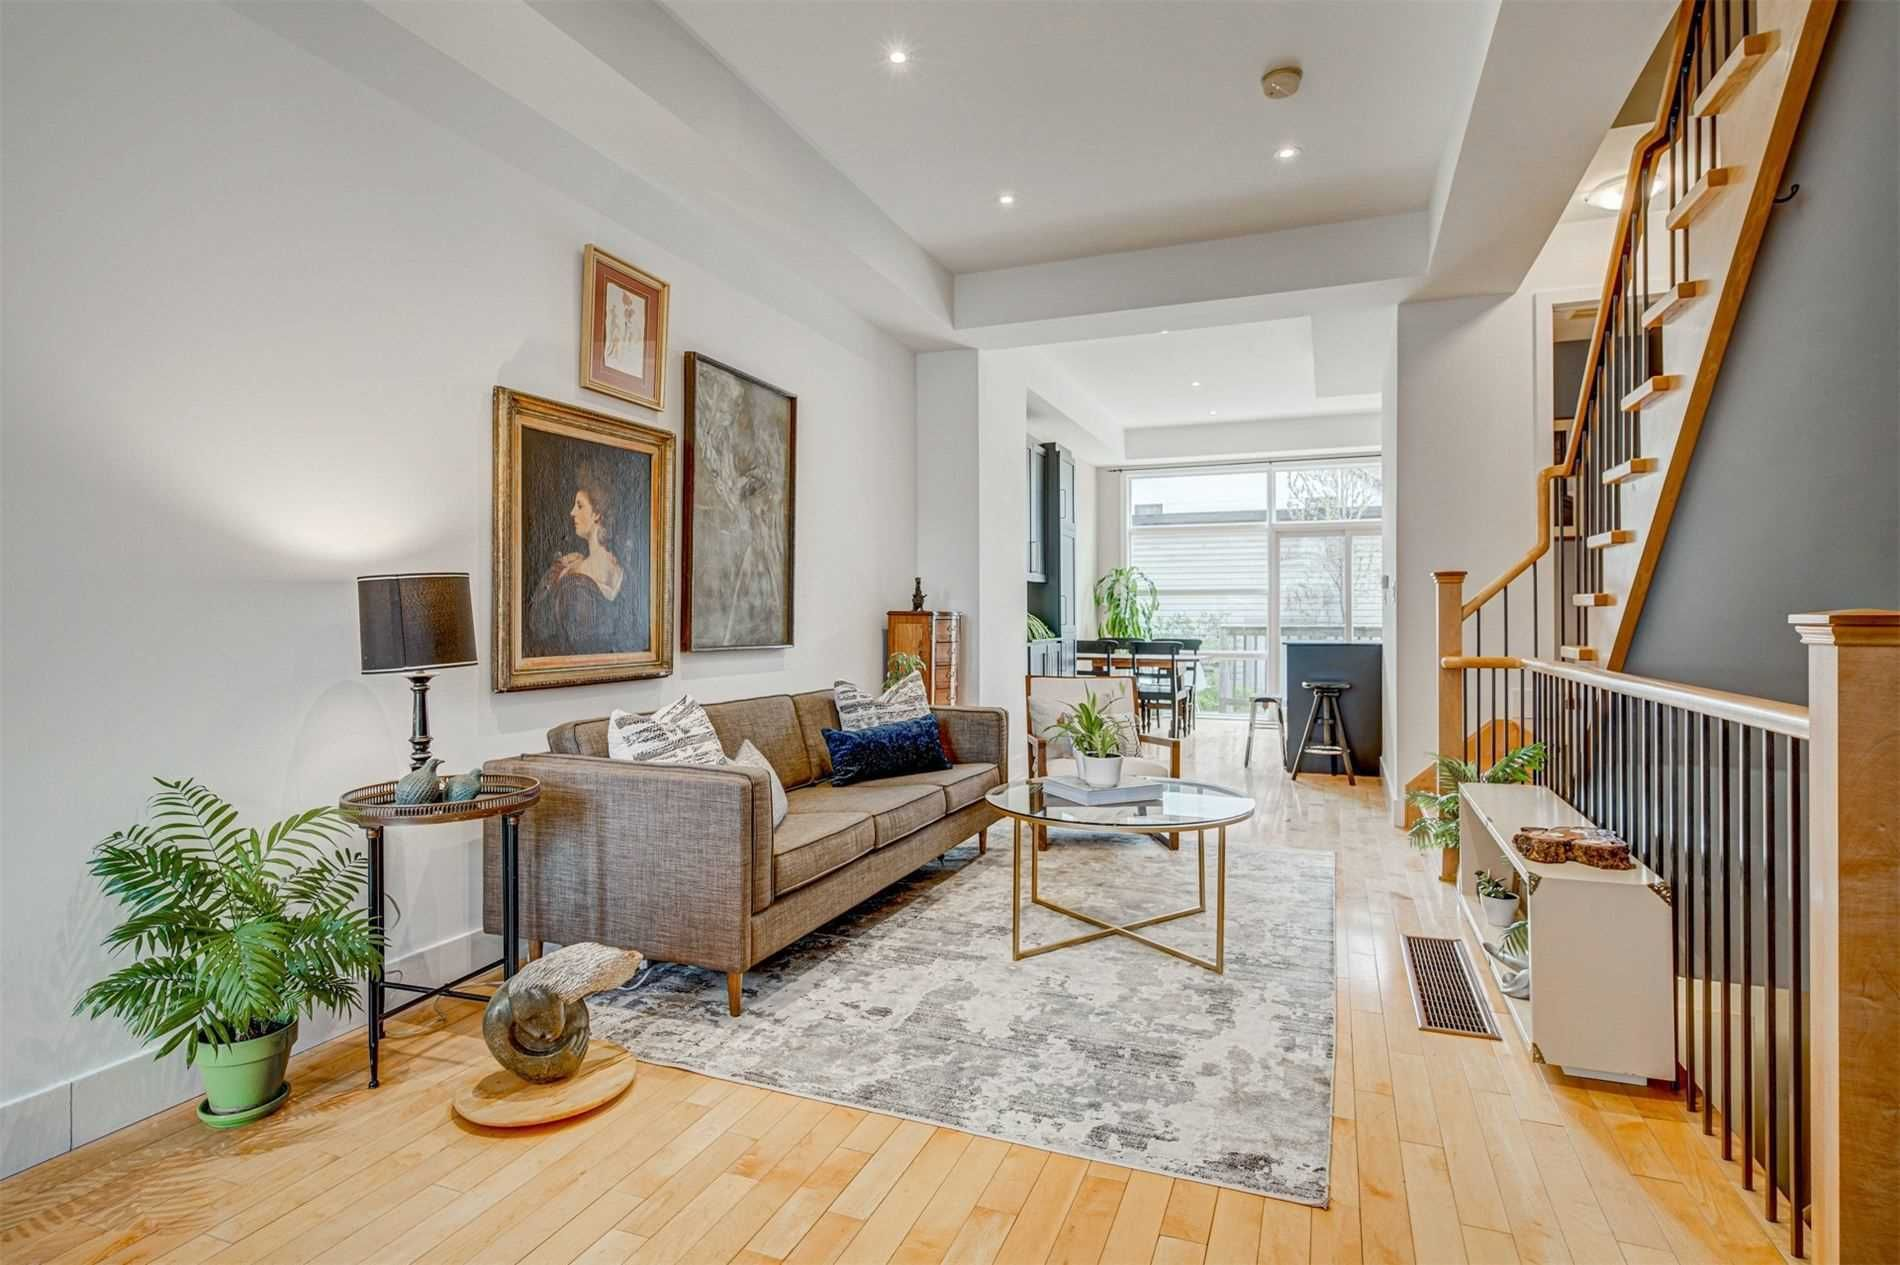 Main Photo: 480 E King Street in Toronto: Moss Park House (3-Storey) for sale (Toronto C08)  : MLS®# C5233475